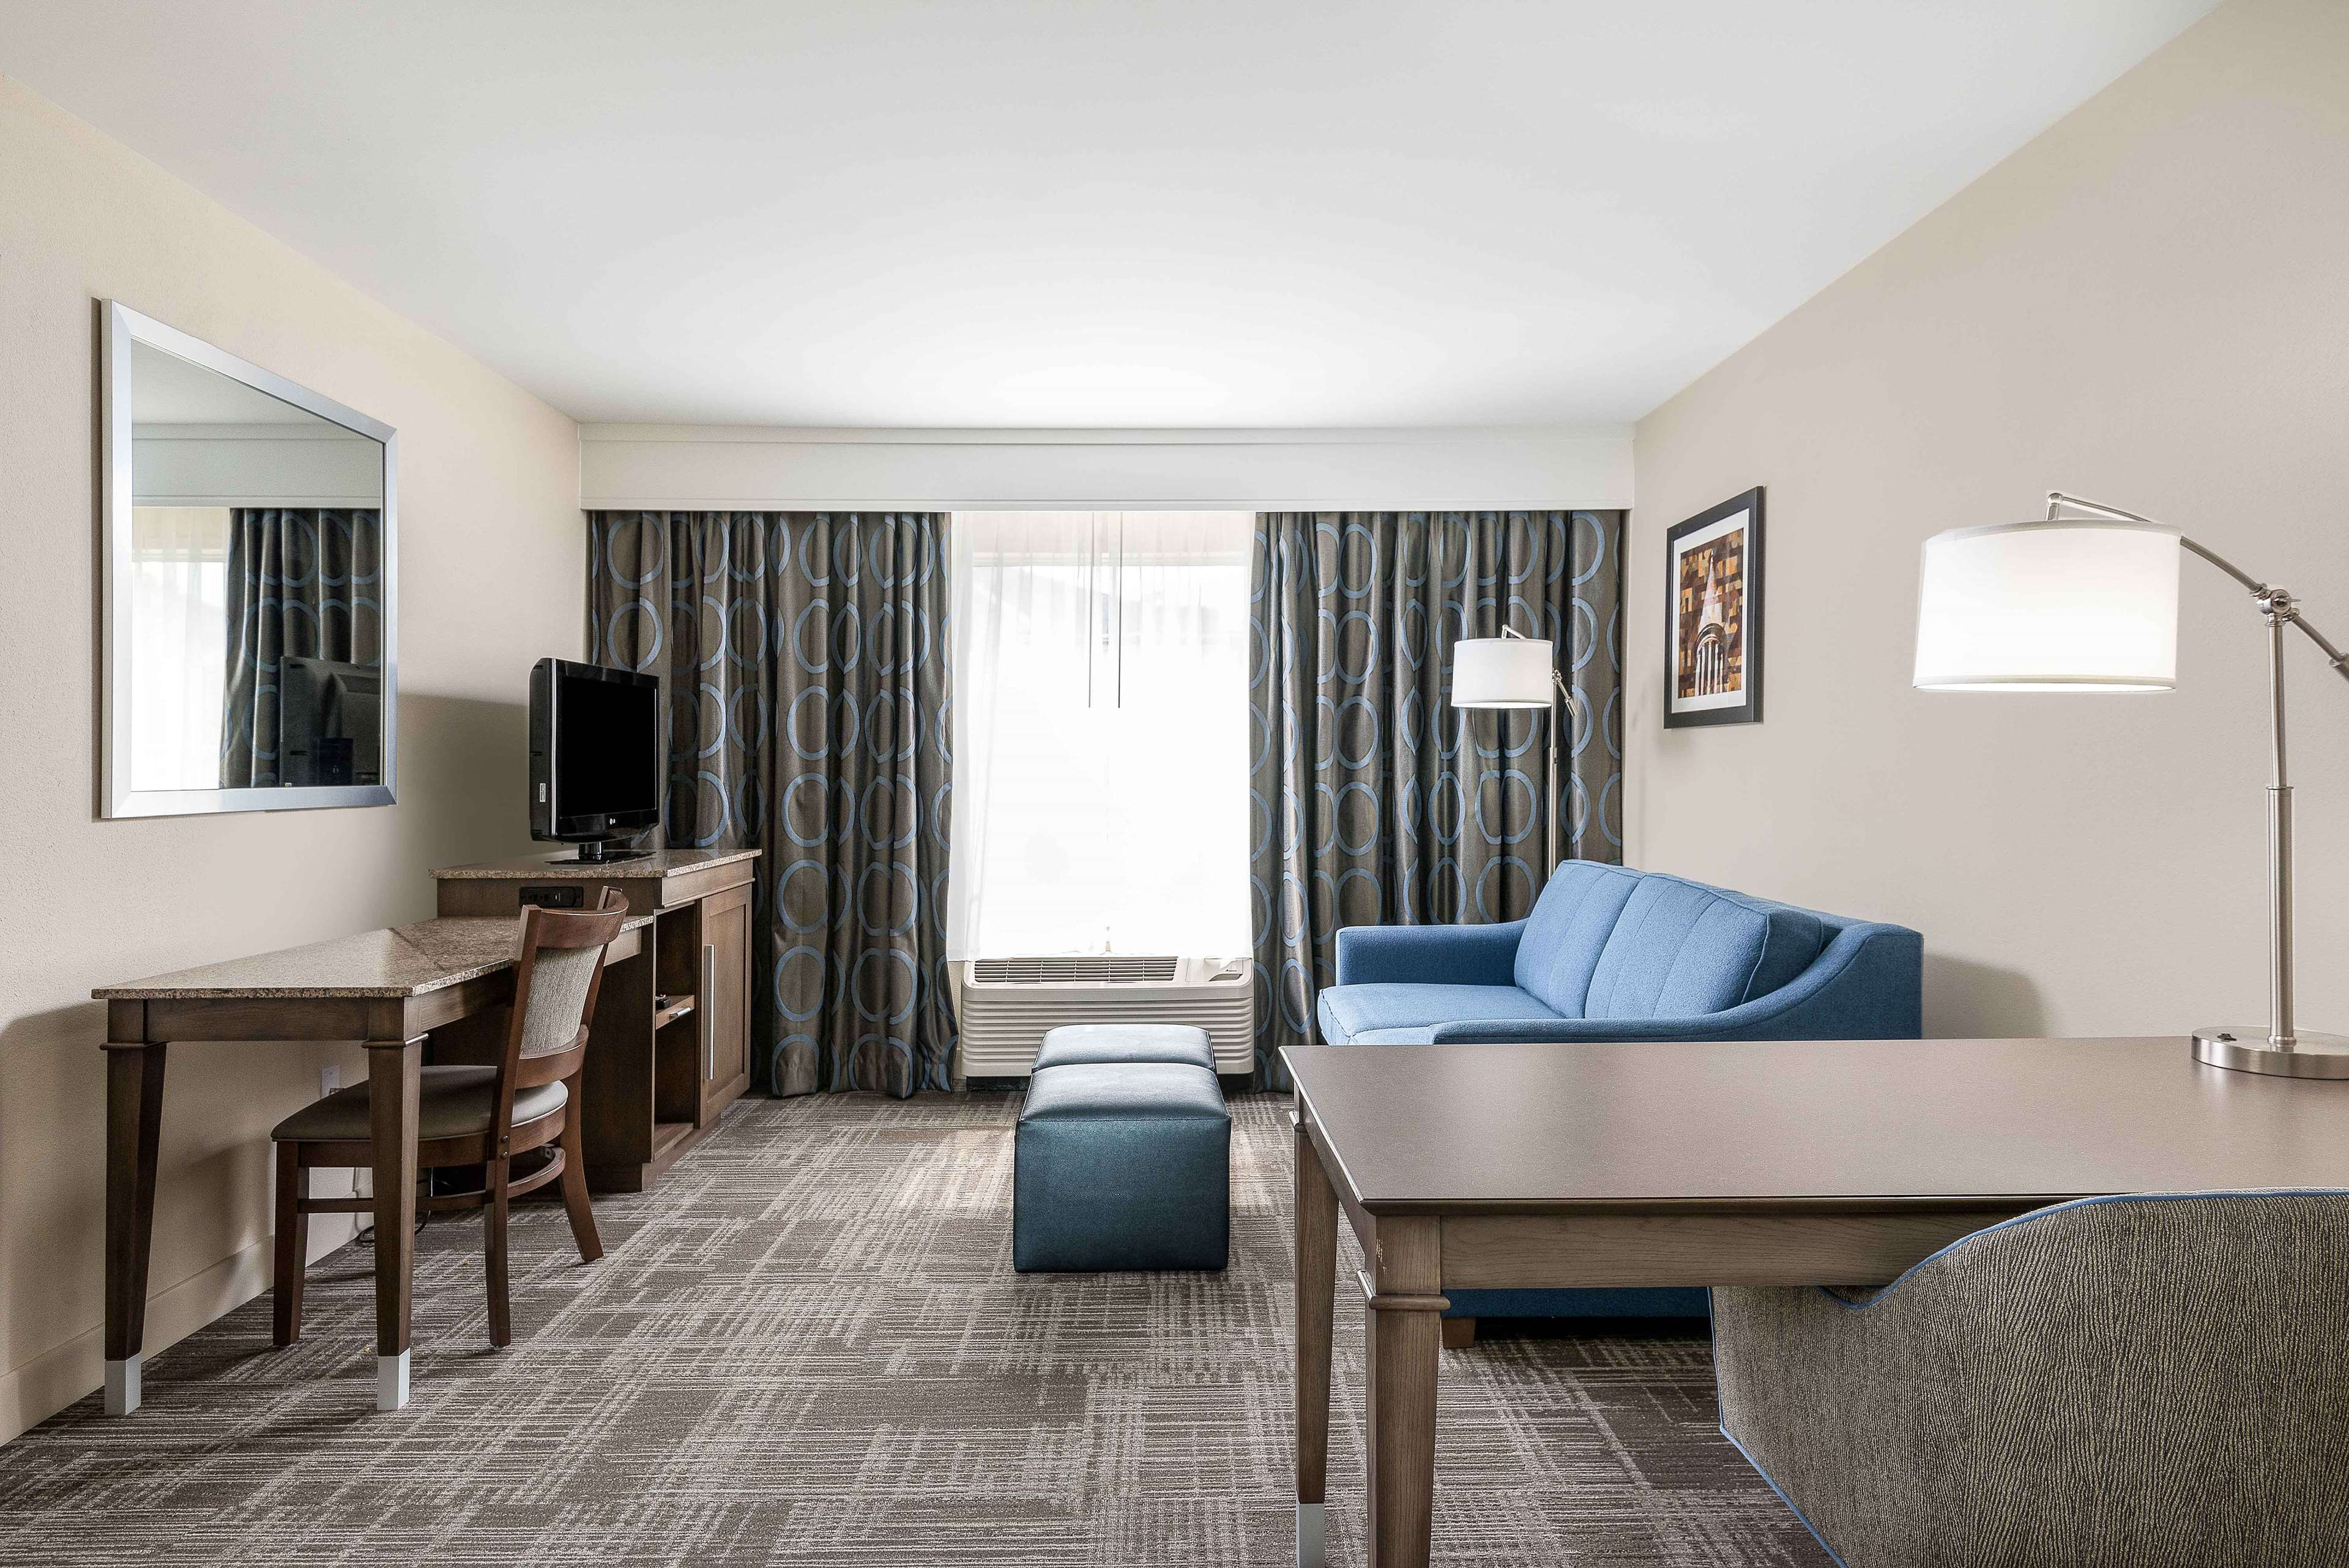 Hampton Inn & Suites Chapel Hill/Durham, Area image 20